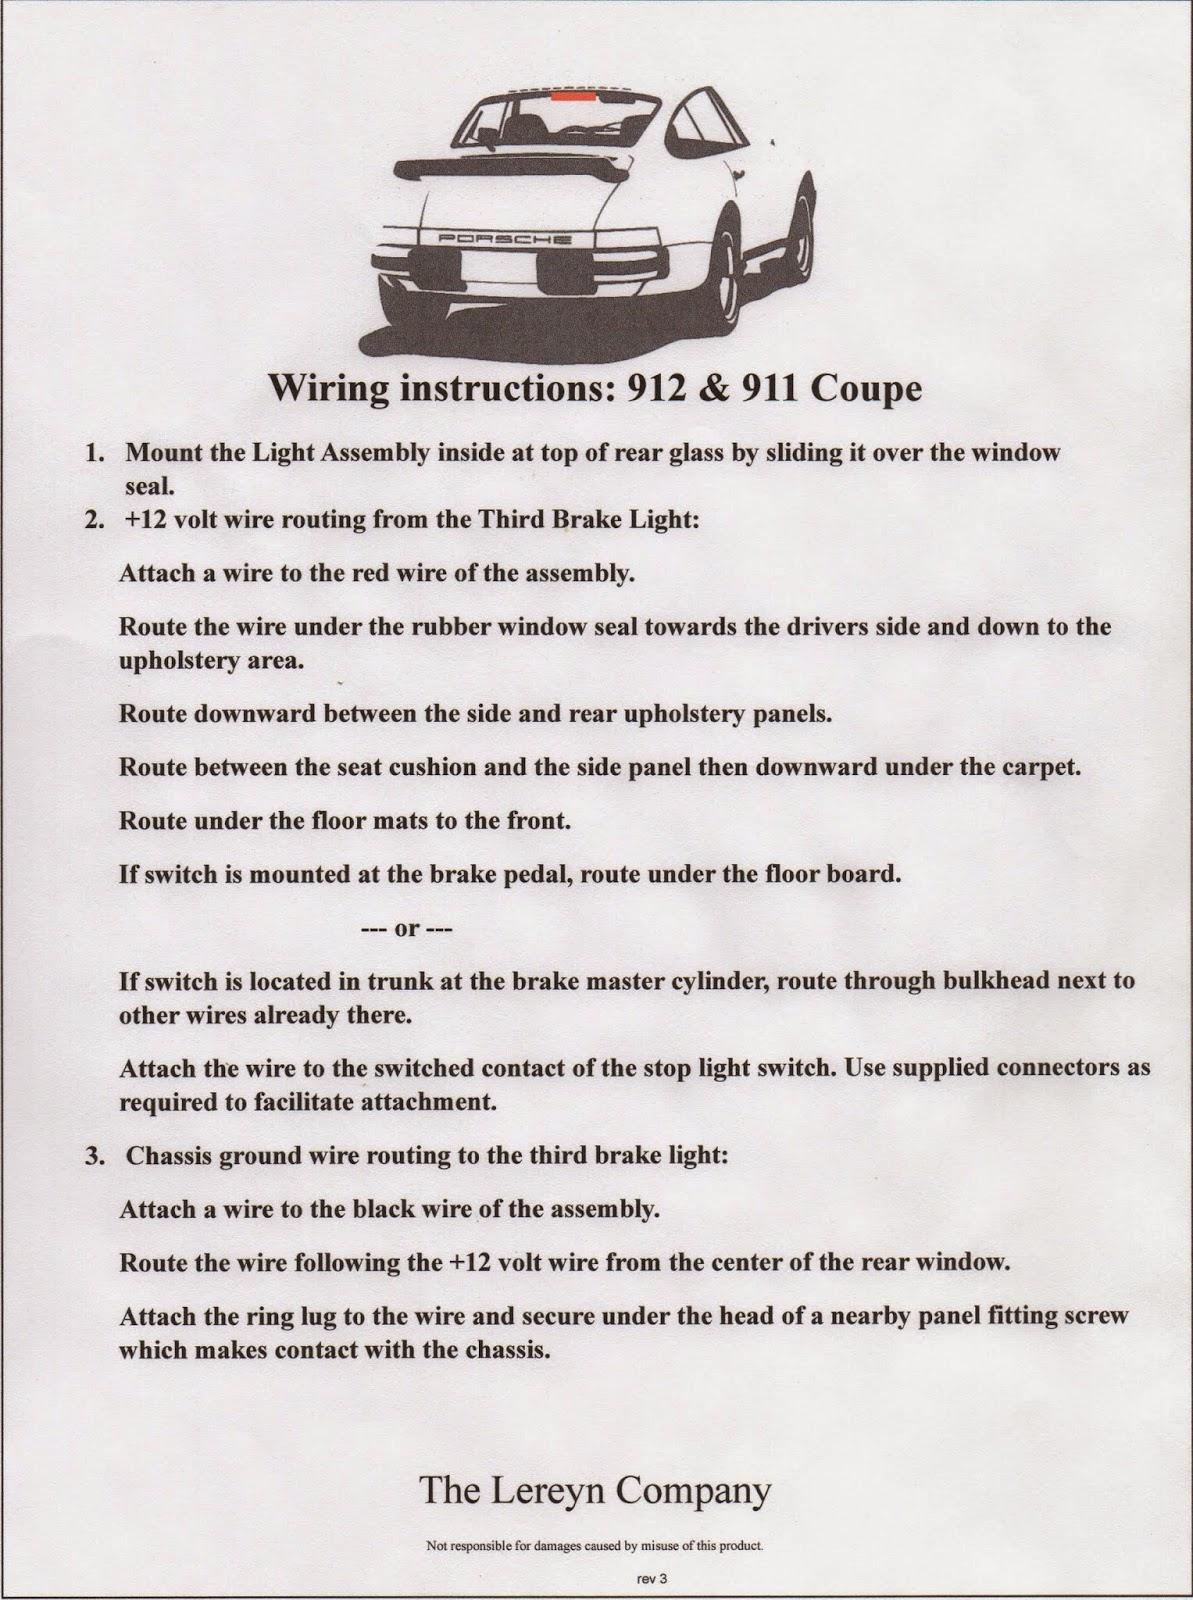 Third Brake Lights for 356, 912 and 911 Porsches